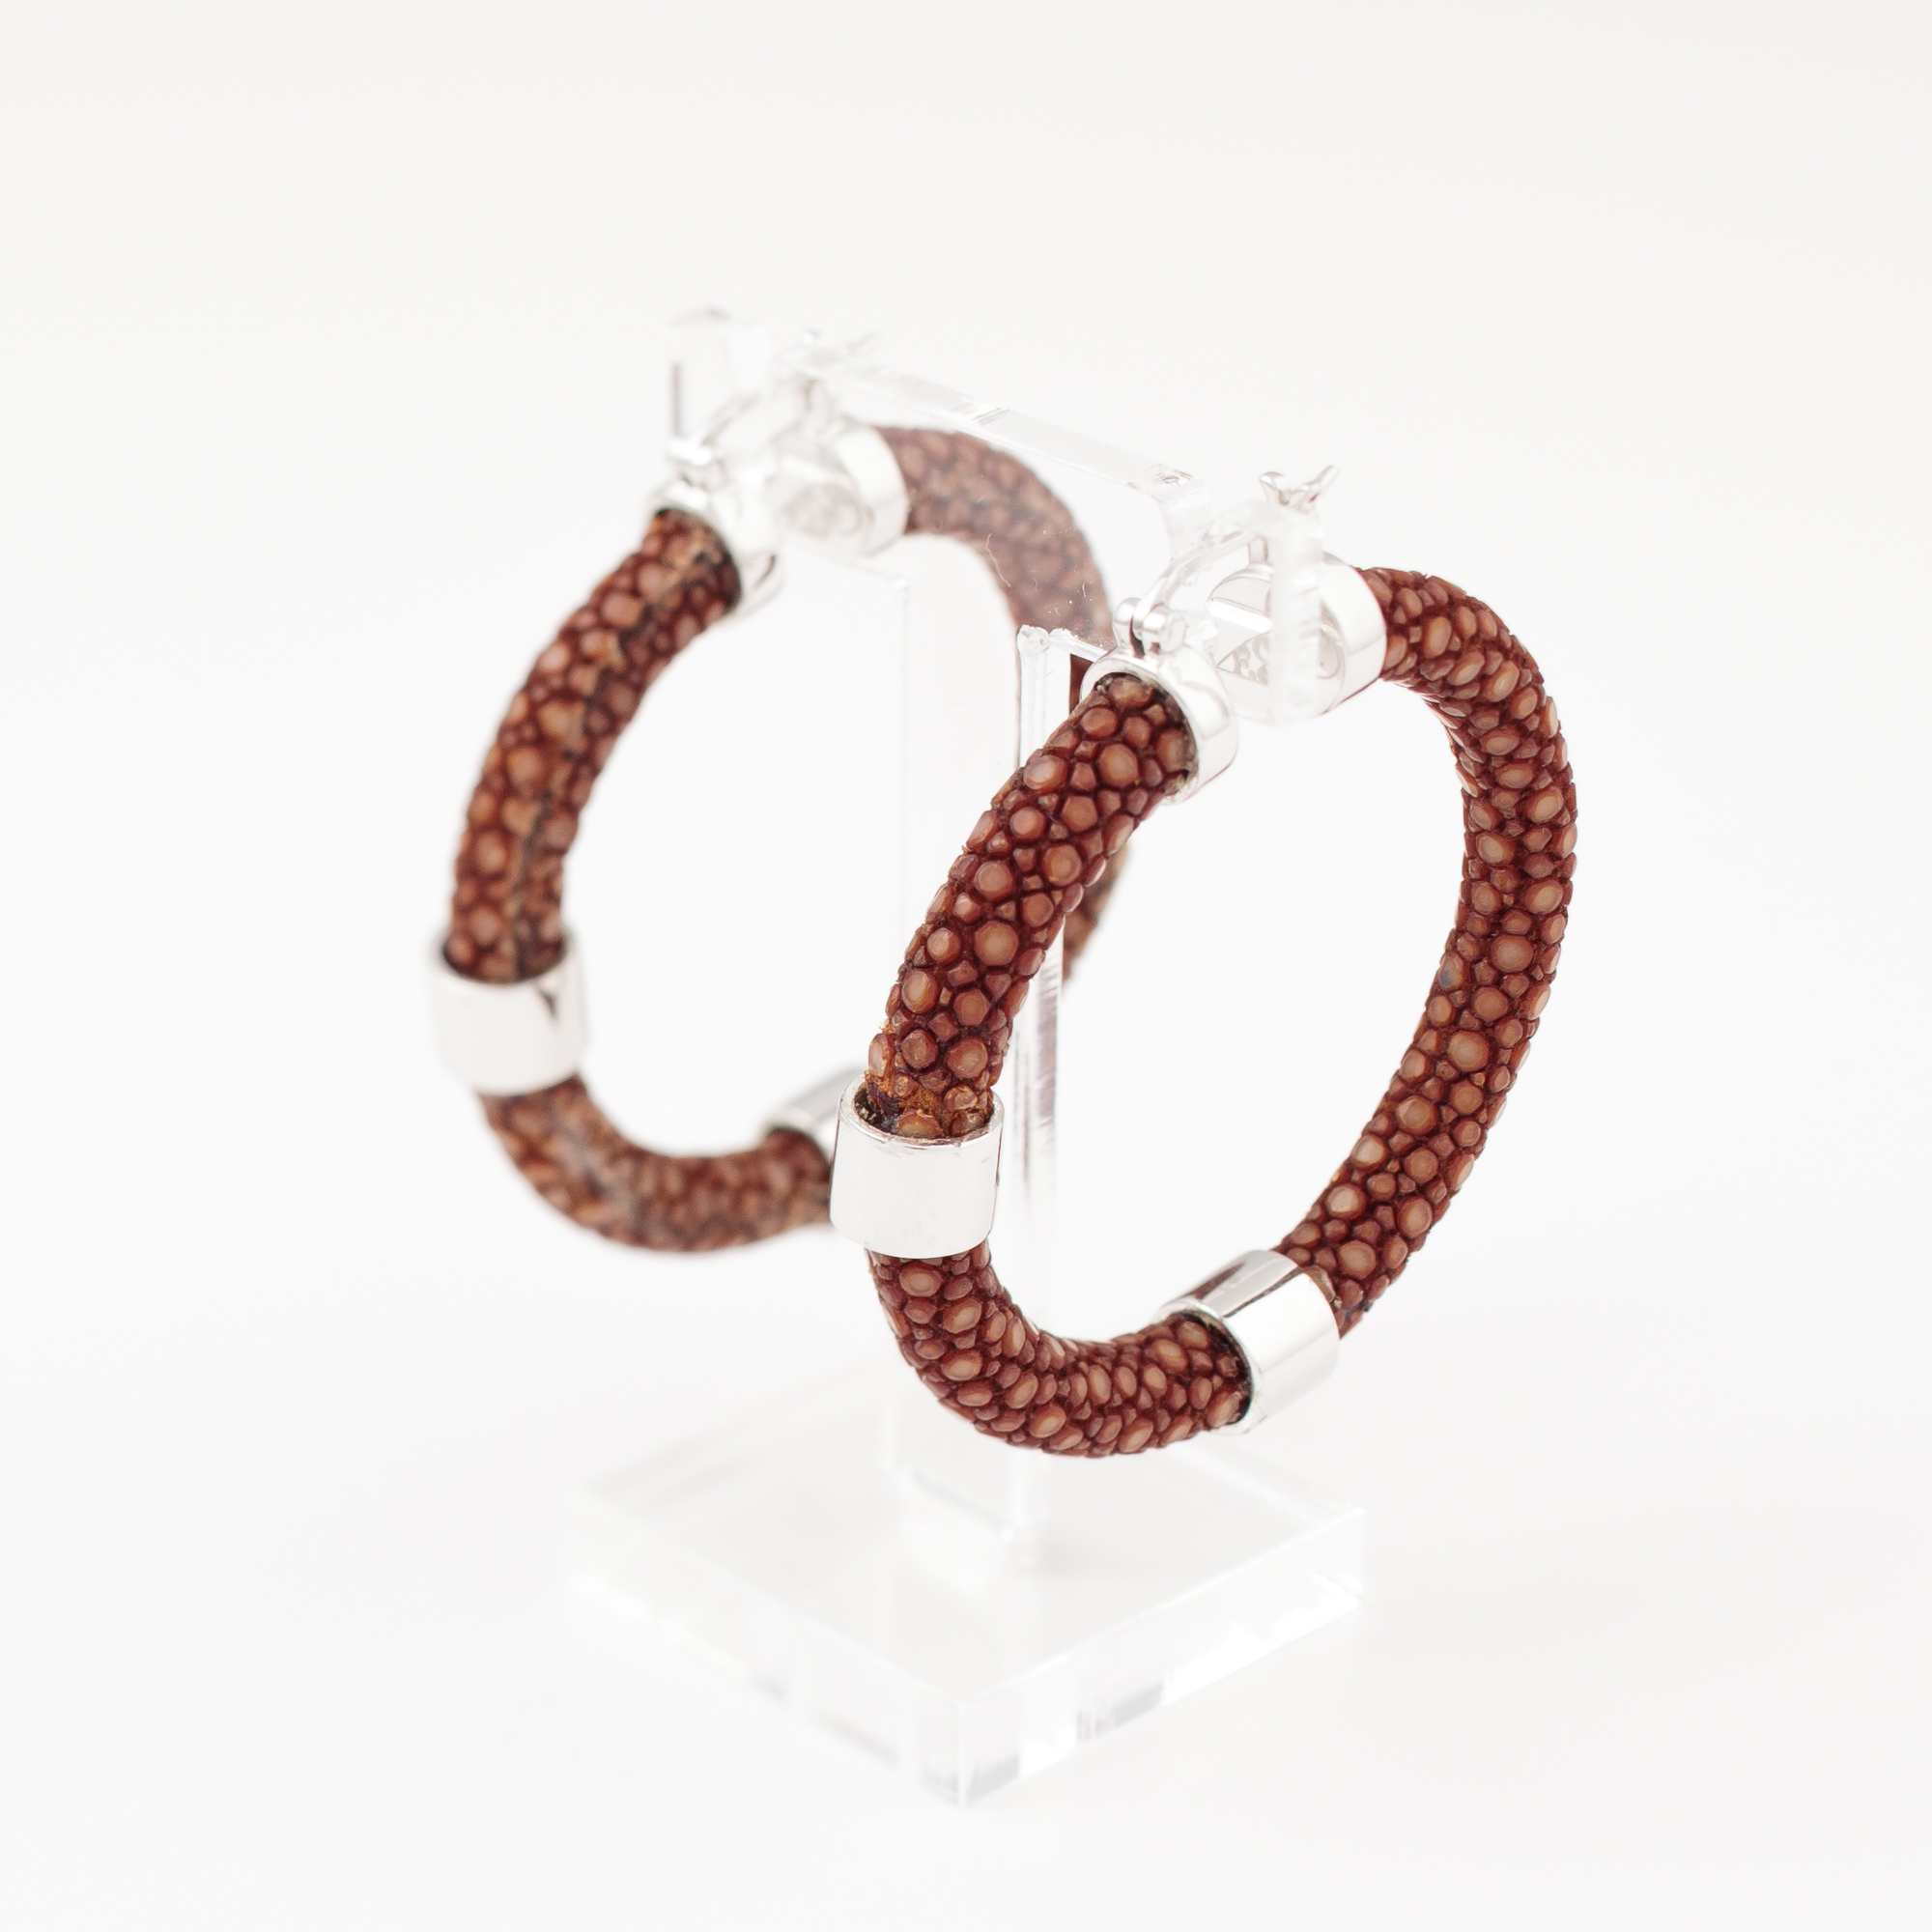 tresor-by-flore-galuchat-boucles-d-oreilles-creole-craneuse-caramel